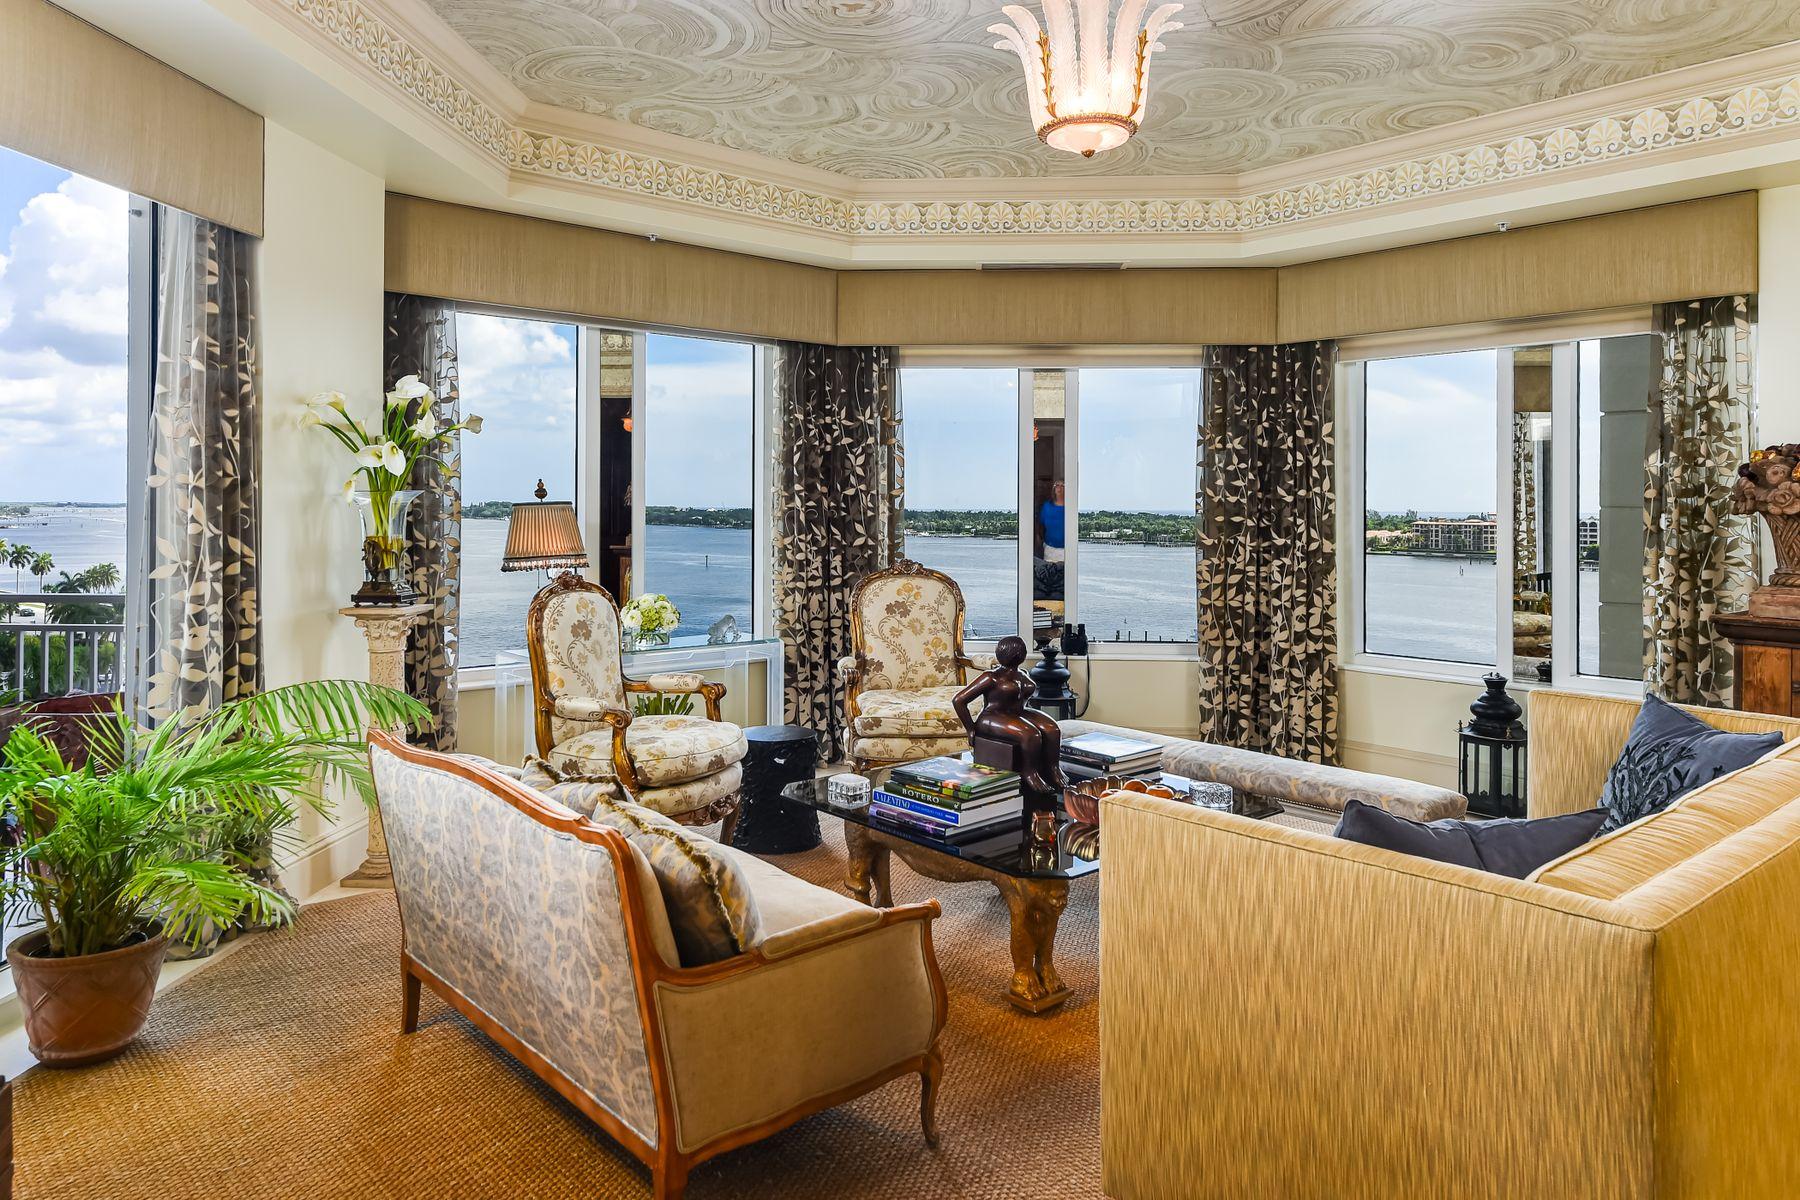 Condominiums для того Продажа на One Watermark Place Unit 701 622 N Flagler Dr Apt 701 West Palm Beach, Флорида 33401 Соединенные Штаты